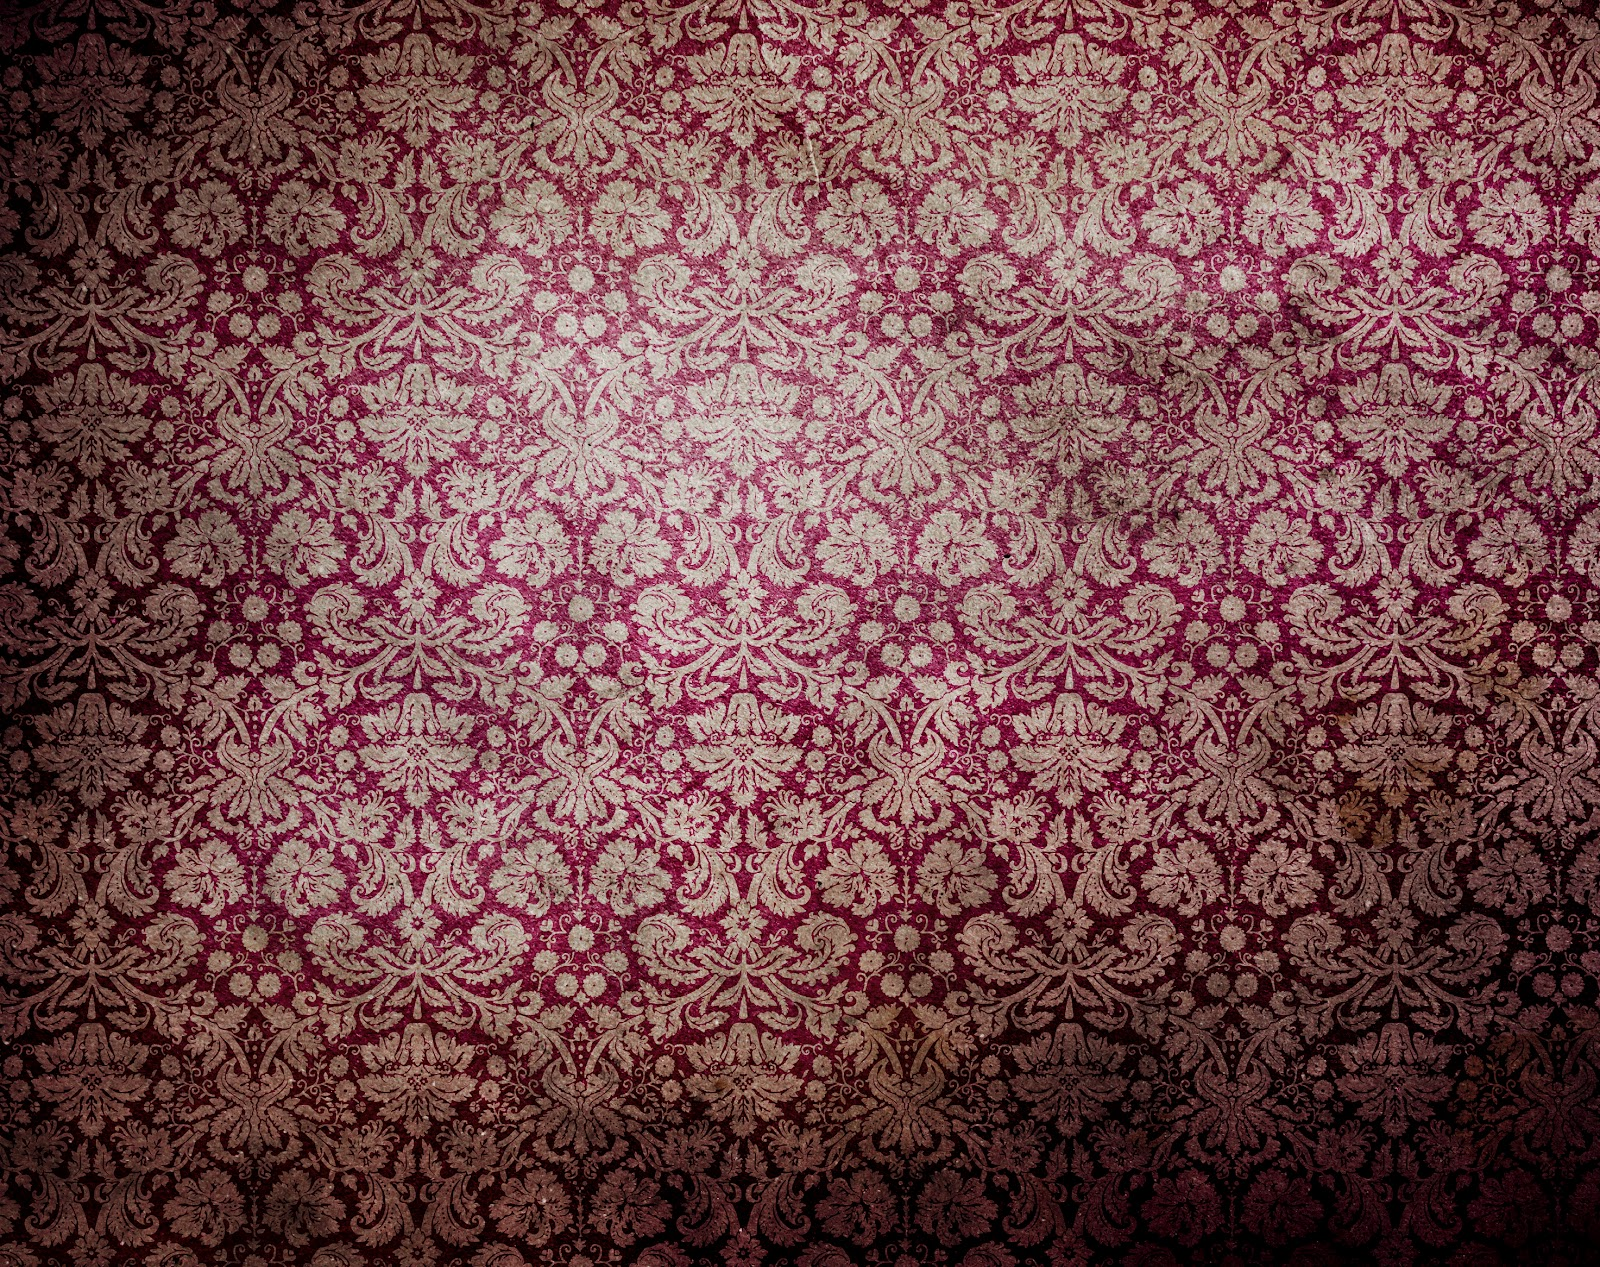 Vintage Wallpaper Wallpaper Imagenes 1600x1267